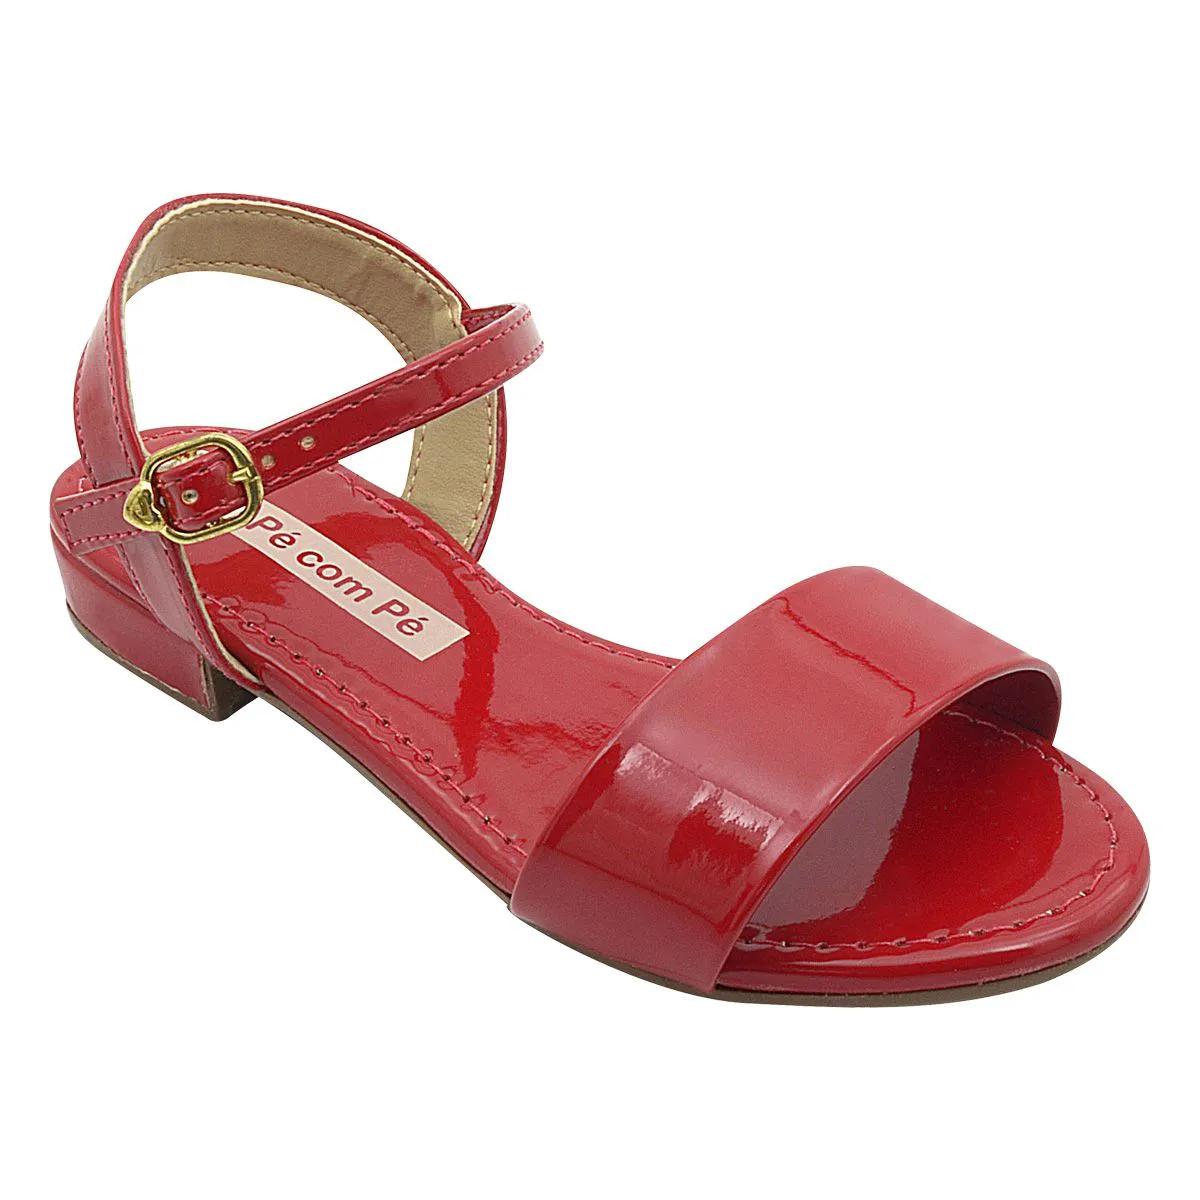 Sandália Infantil Vermelha Verniz Feminina